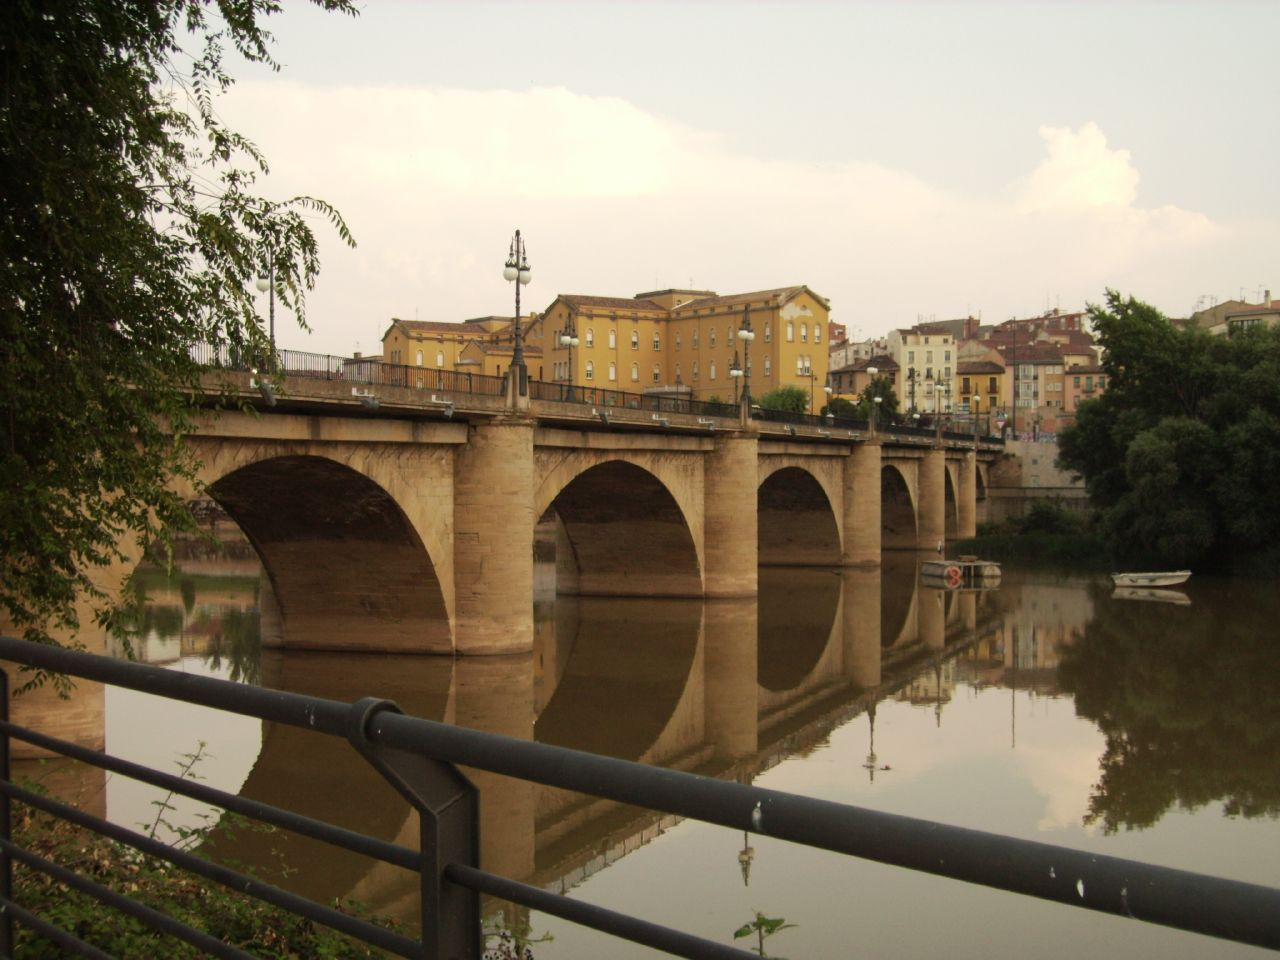 The Apps Tourism Day, en Logroño el próximo septiembre